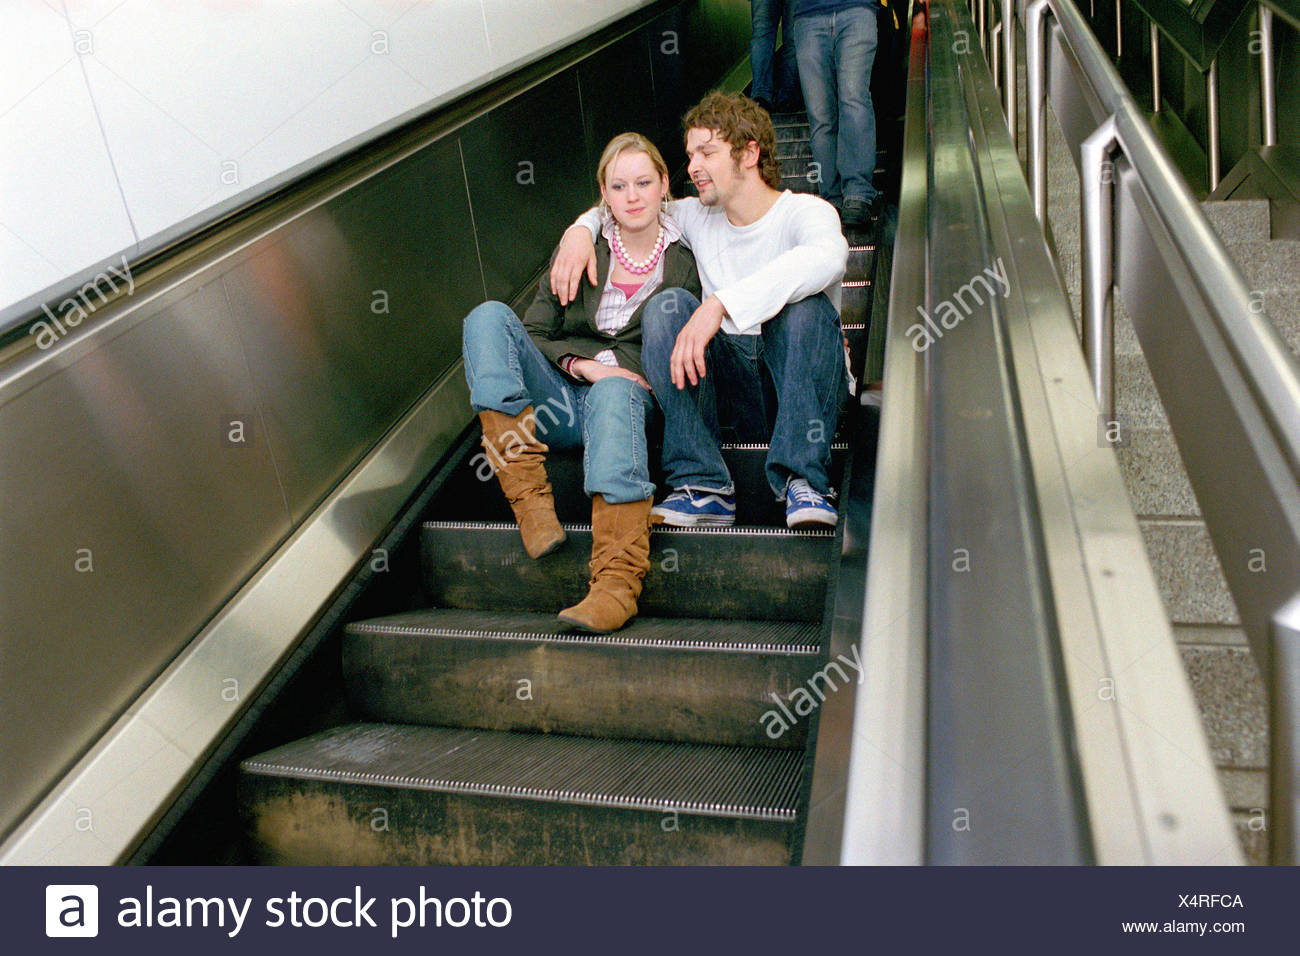 Pareja Sentada en una escalera Foto de stock